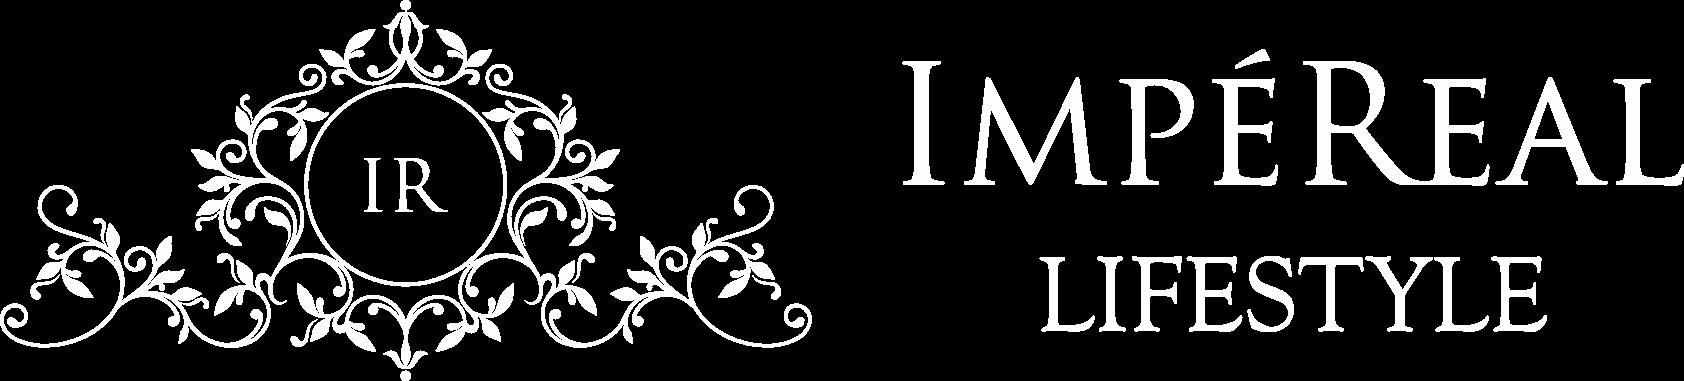 Impereal Logo White